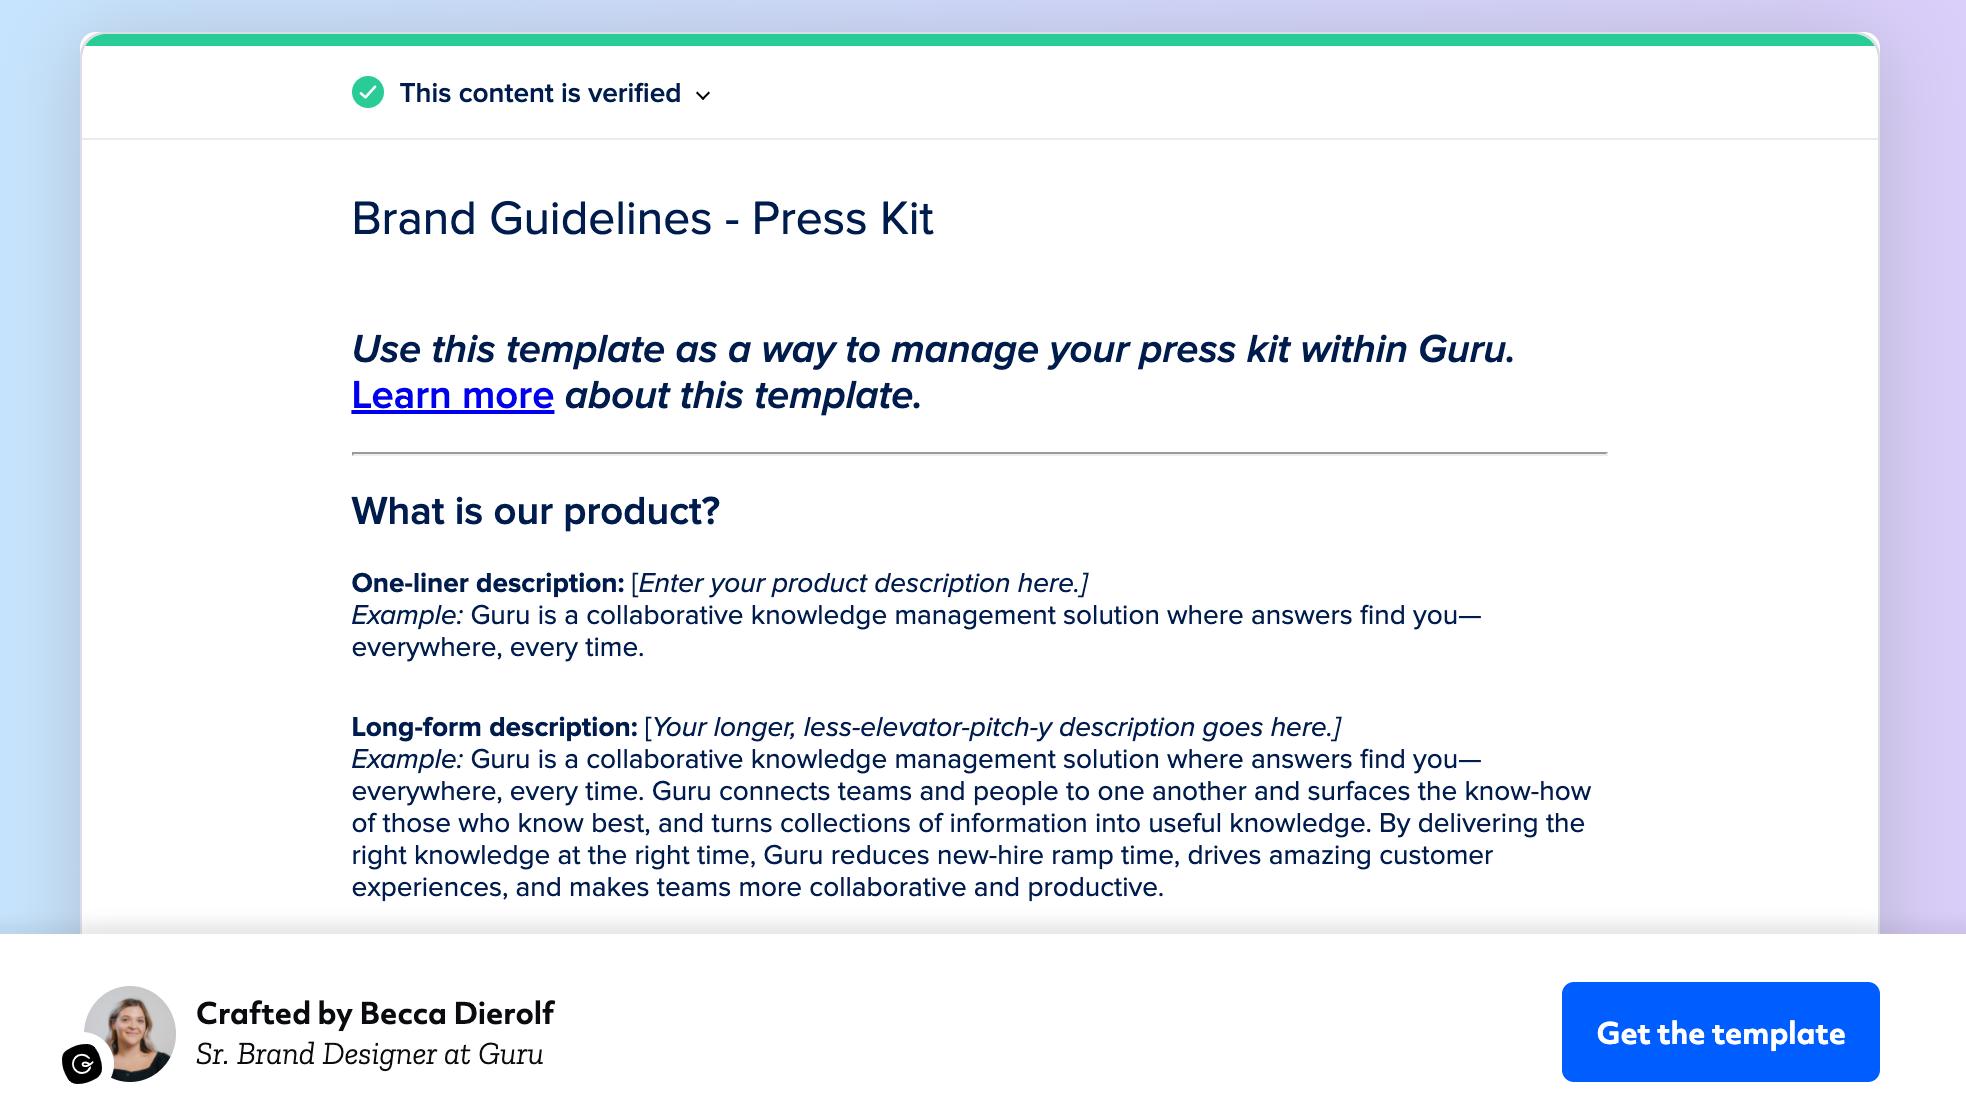 Brand Guidelines - Press Kit